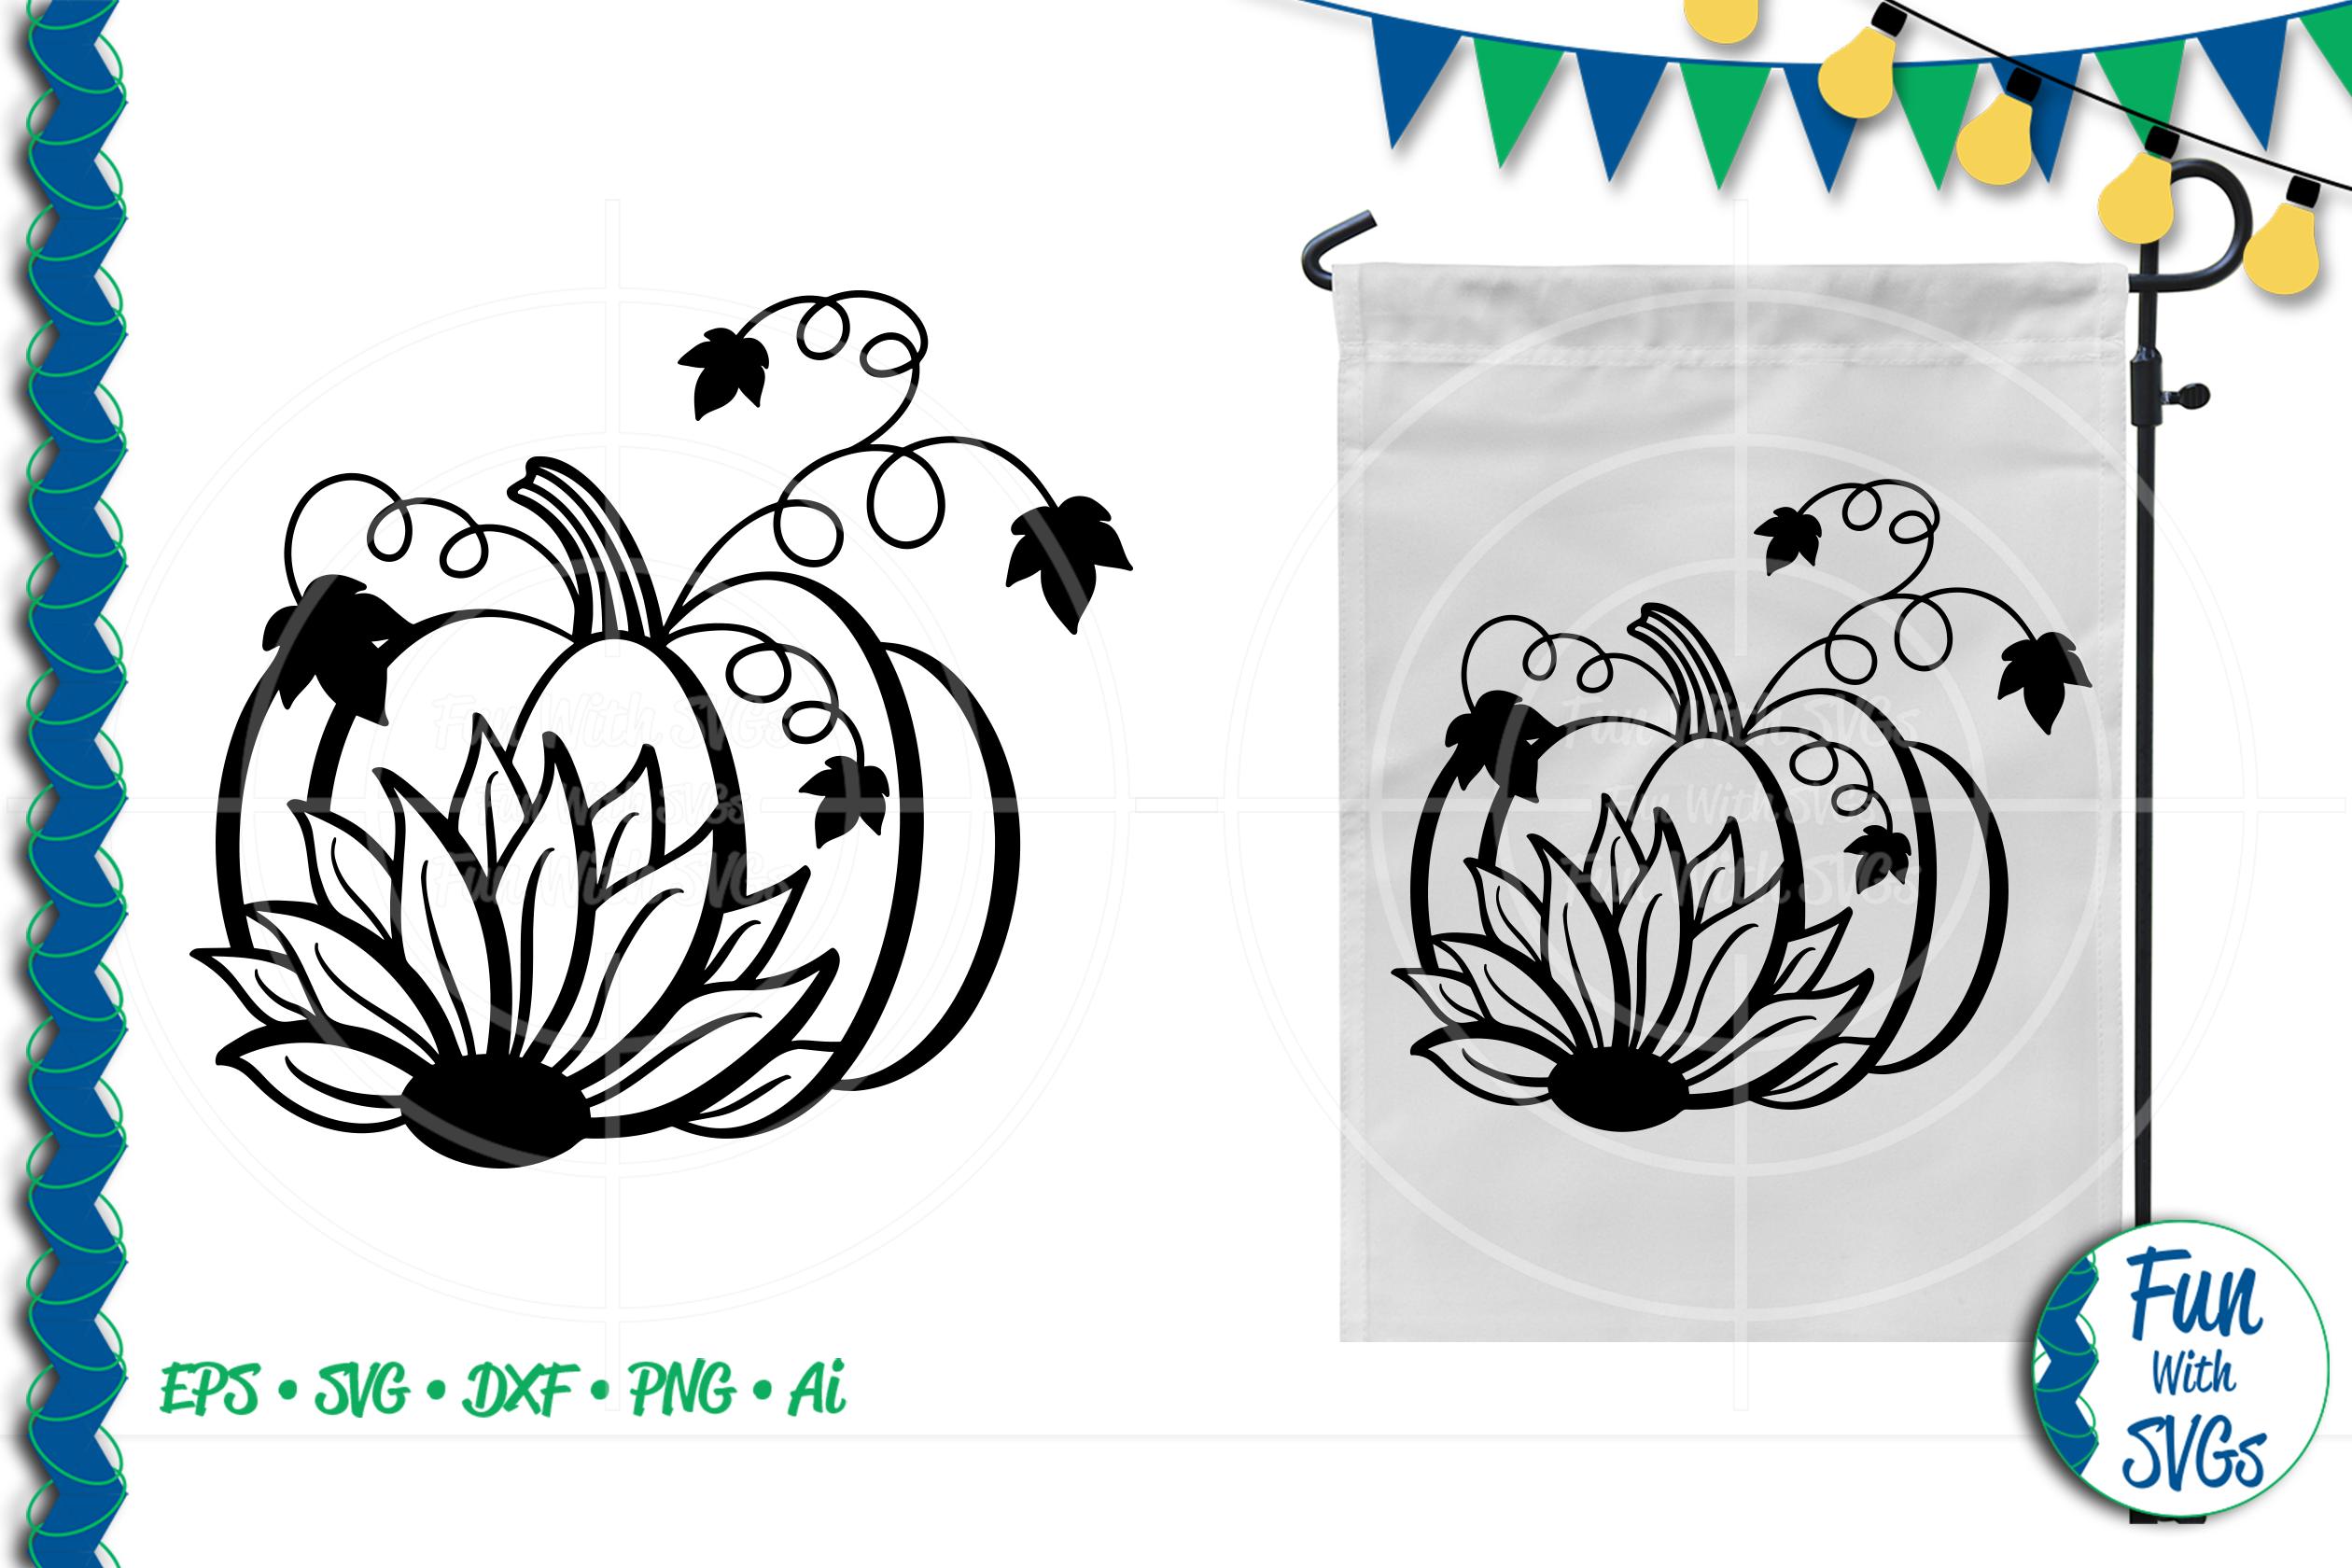 SVG Sunflower Pumpkin Vector, Cut File, Clip Art FWS277 example image 1